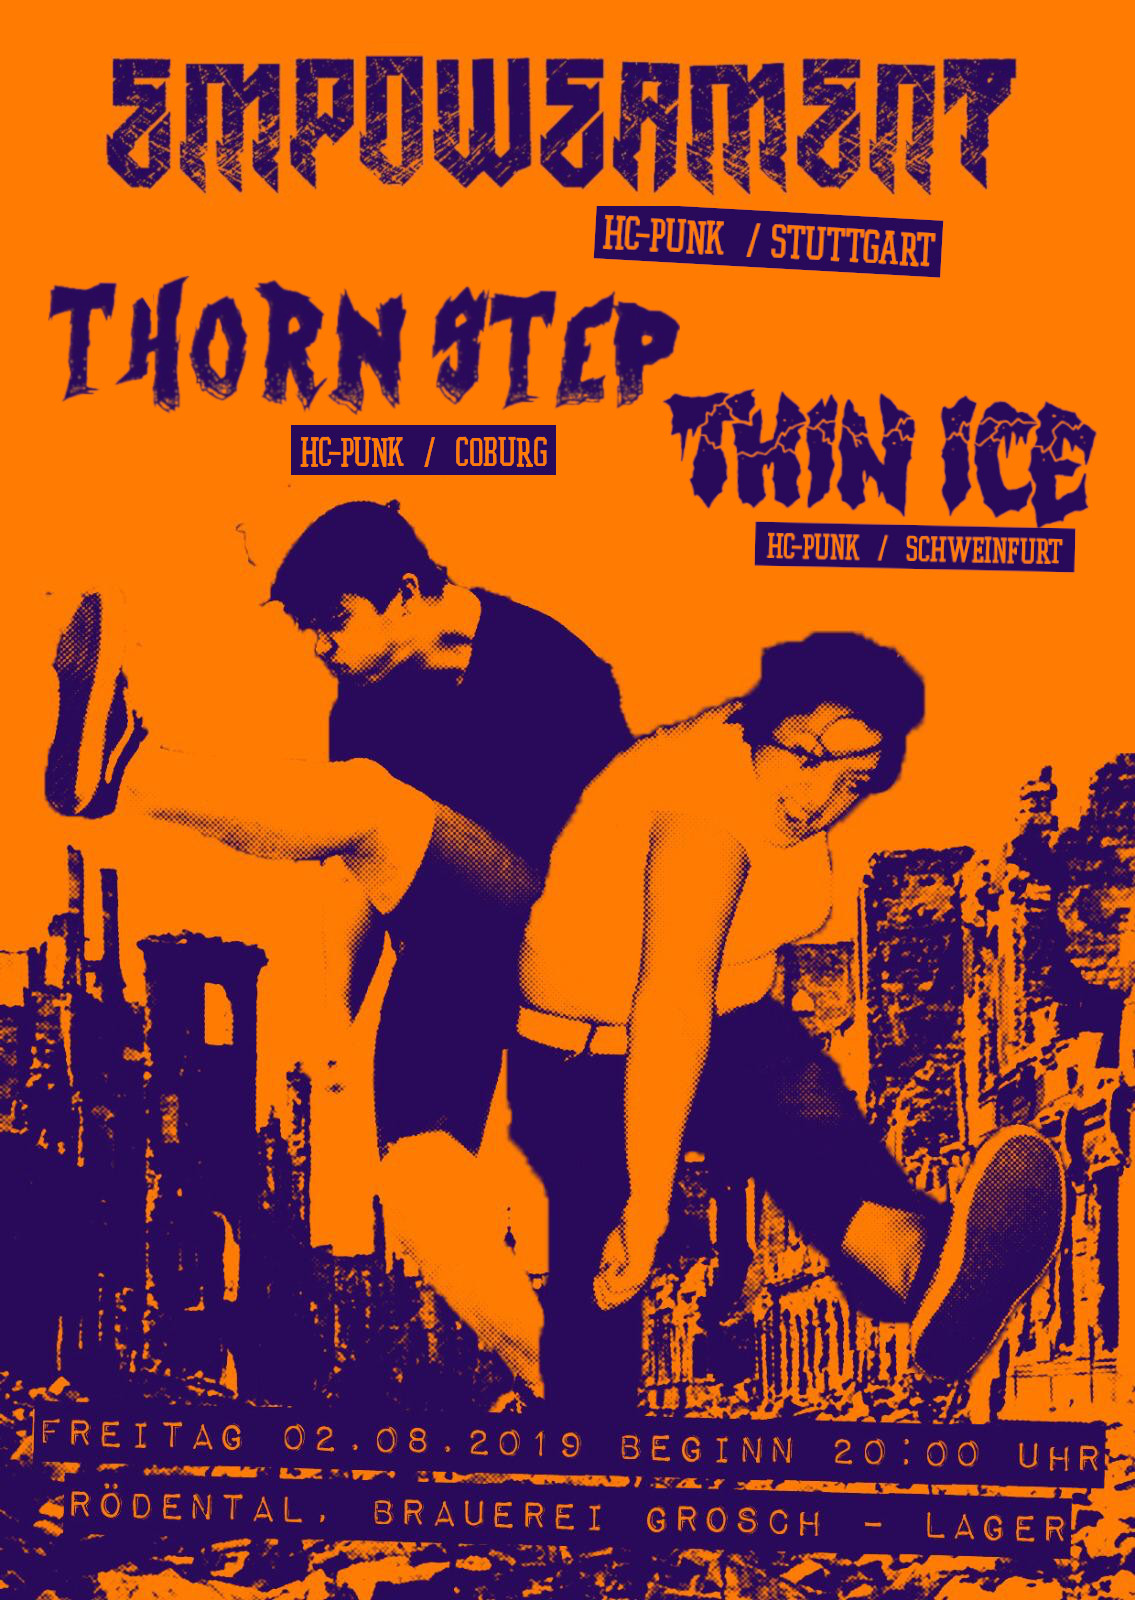 Empowerment, Thorn Step, Thin Ice - Brauerei Brosch, Rödental 2019